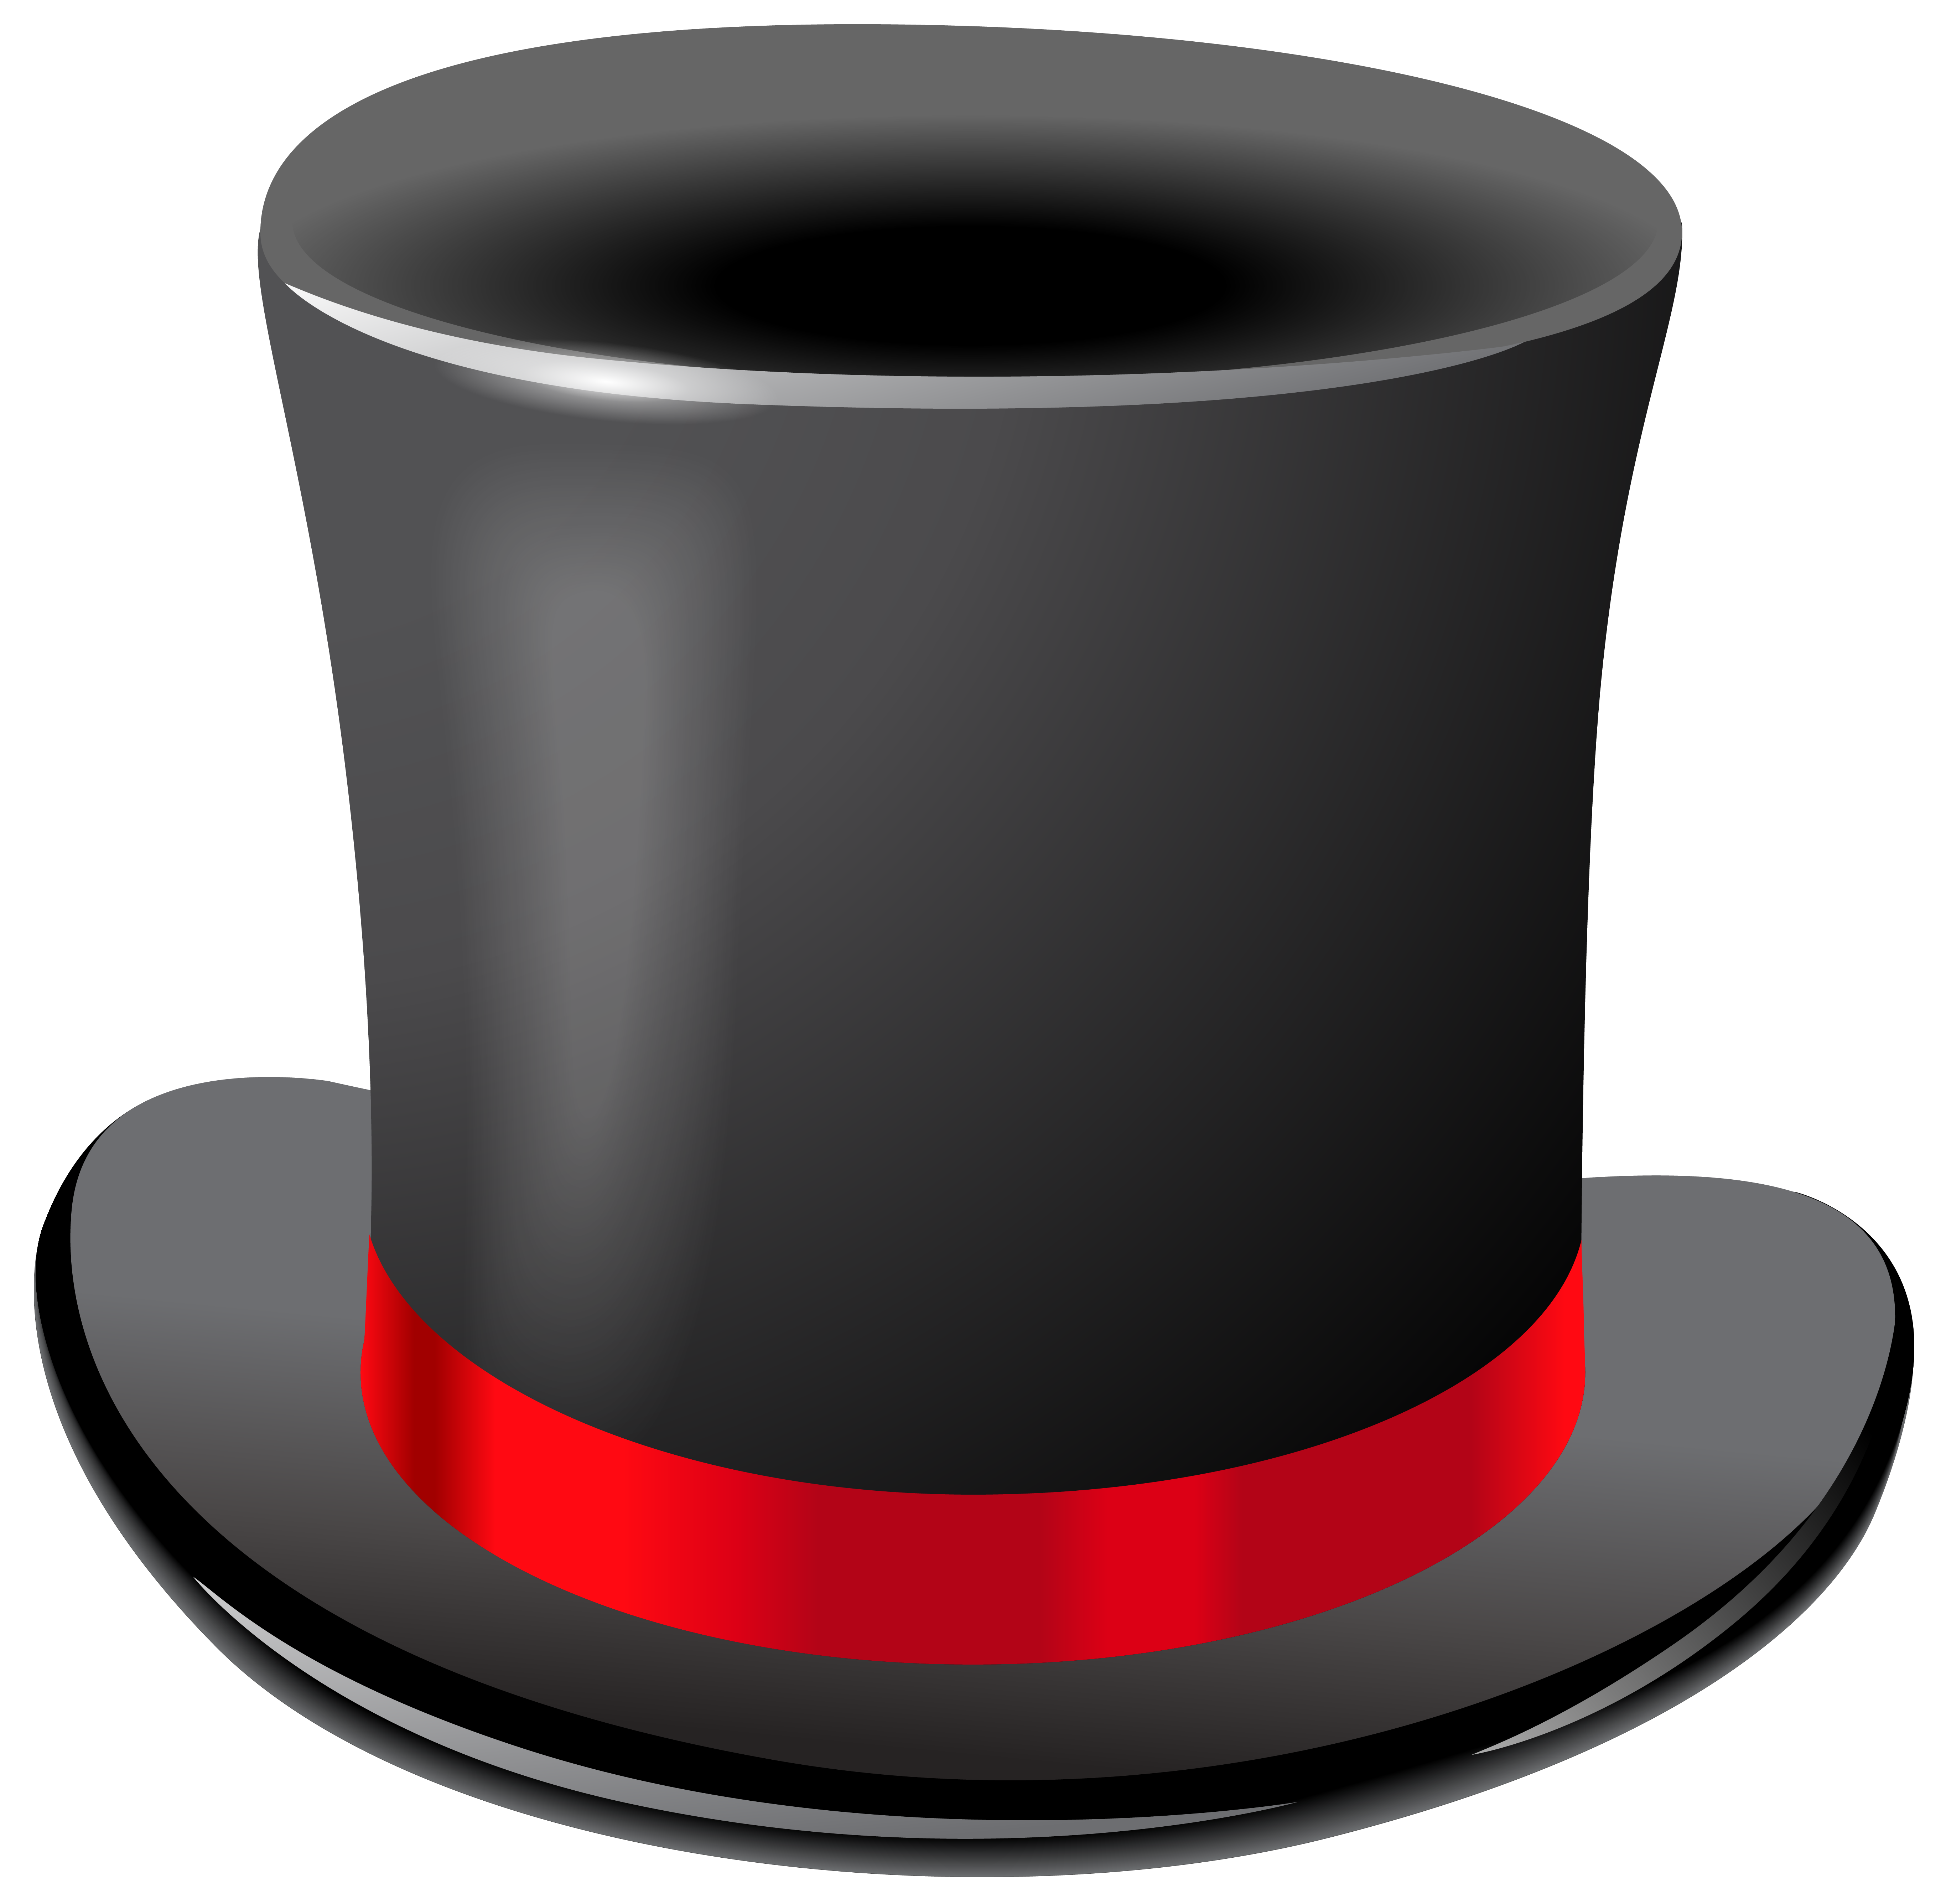 Black Top Hat Transparent PNG Clip Art Image.